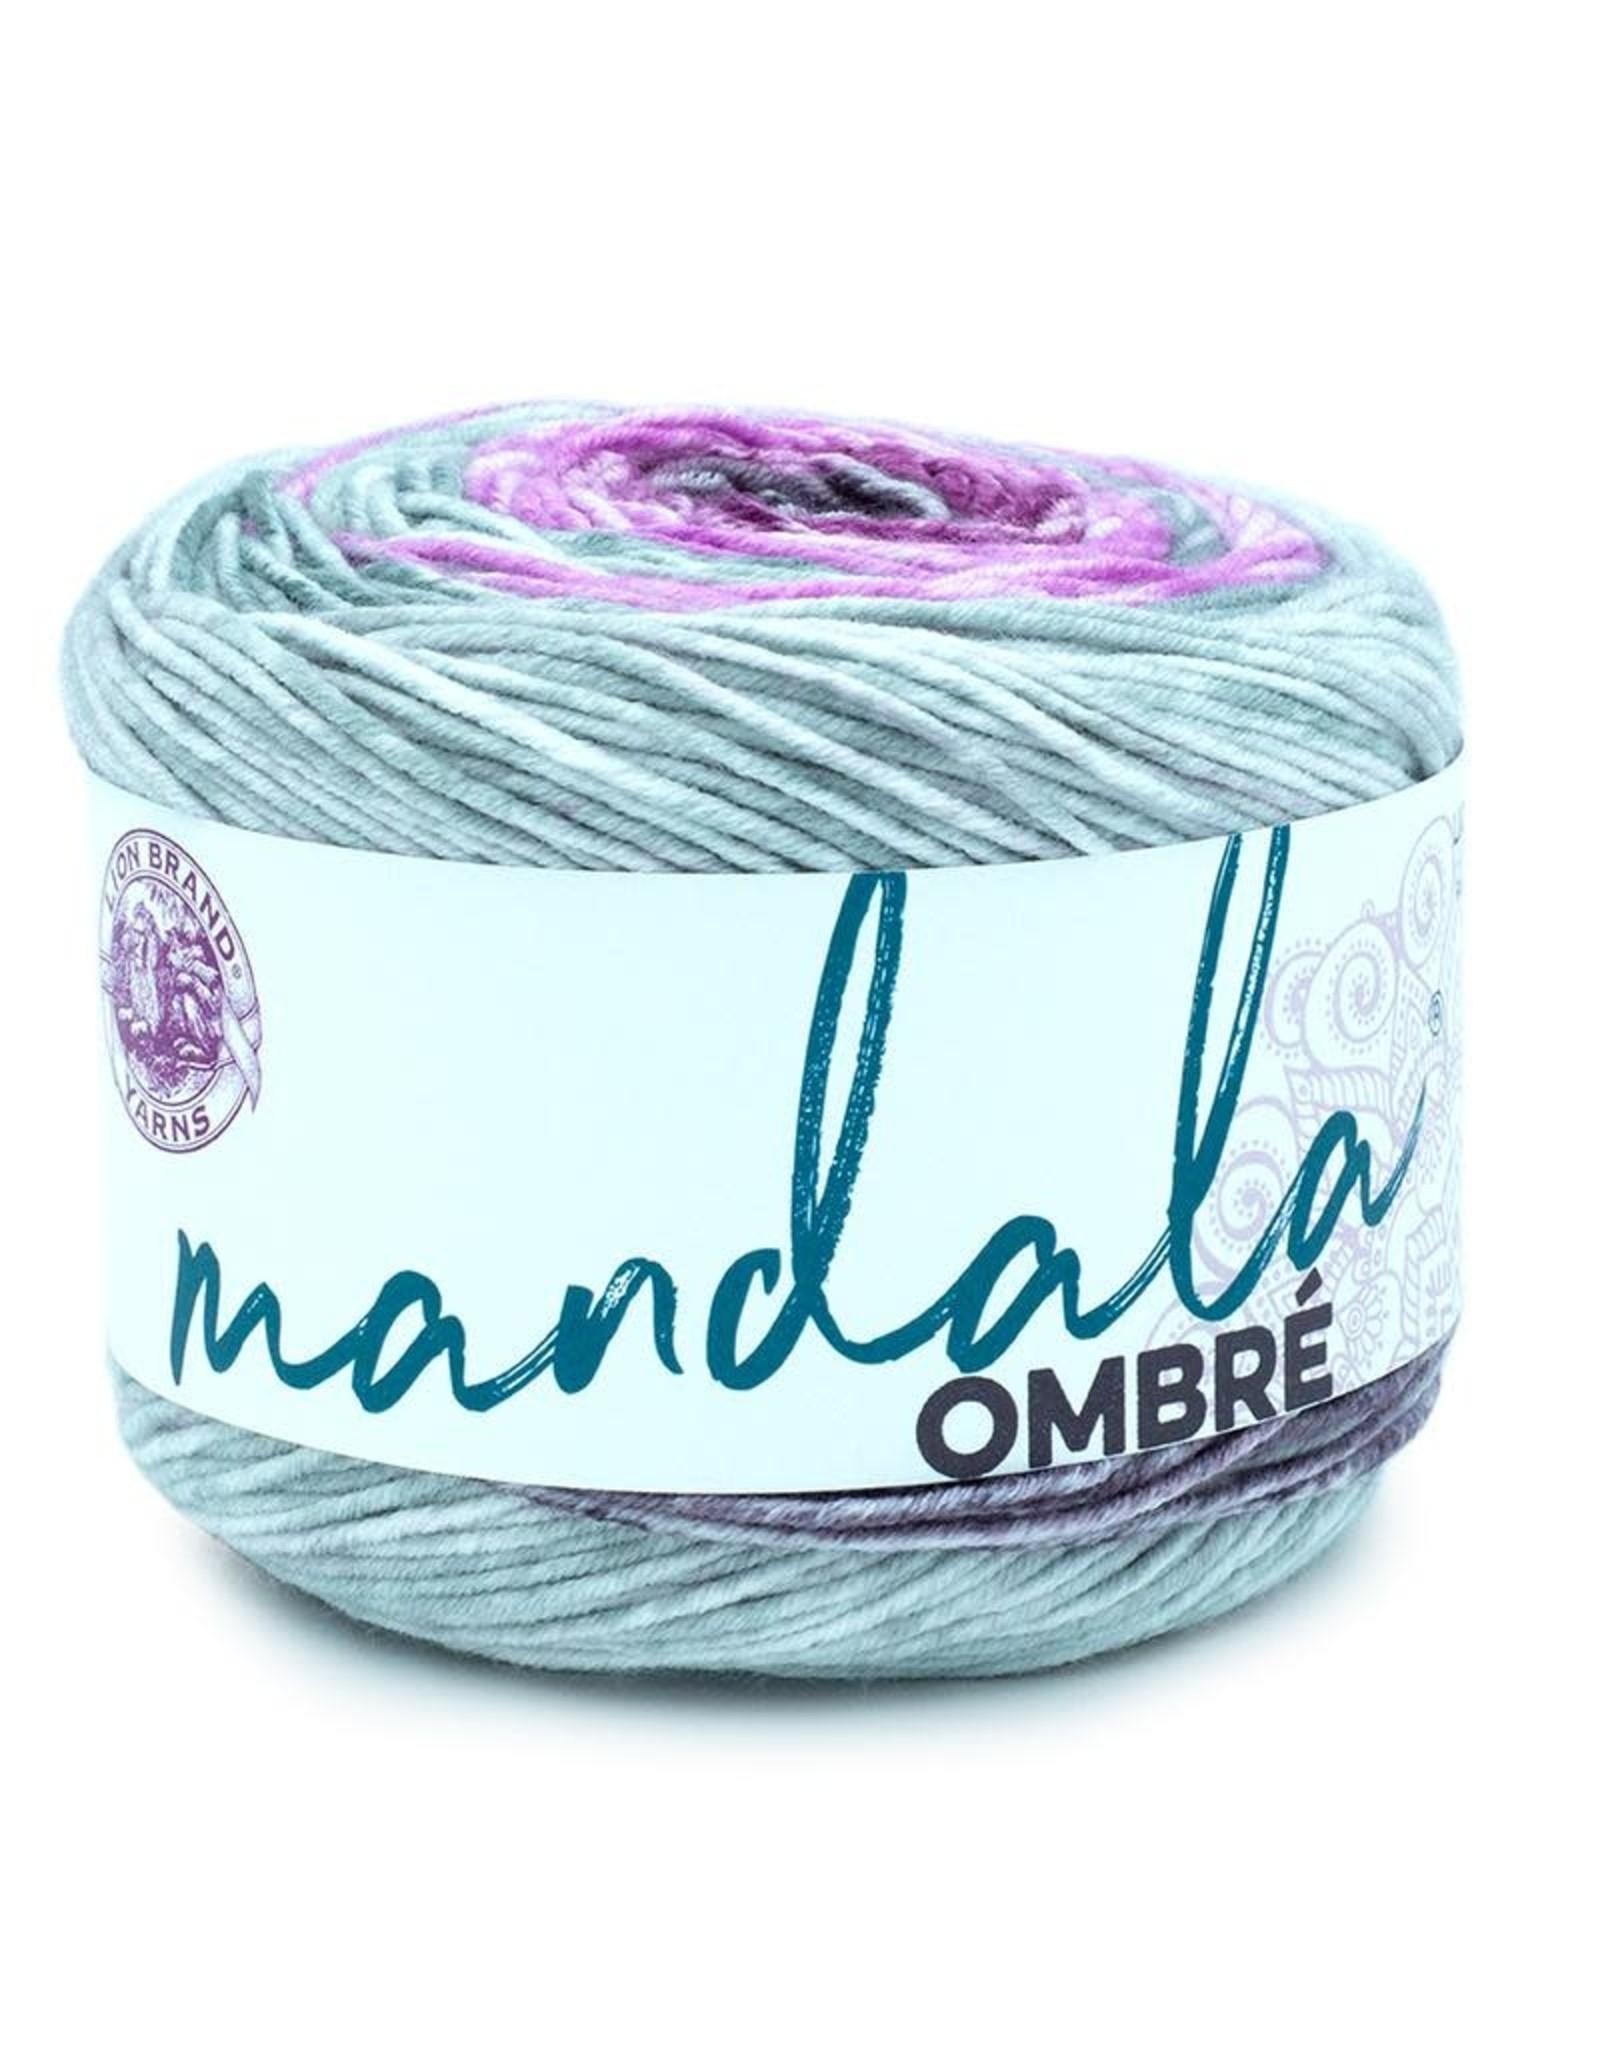 Joy - Mandala Ombre - Lion Brand